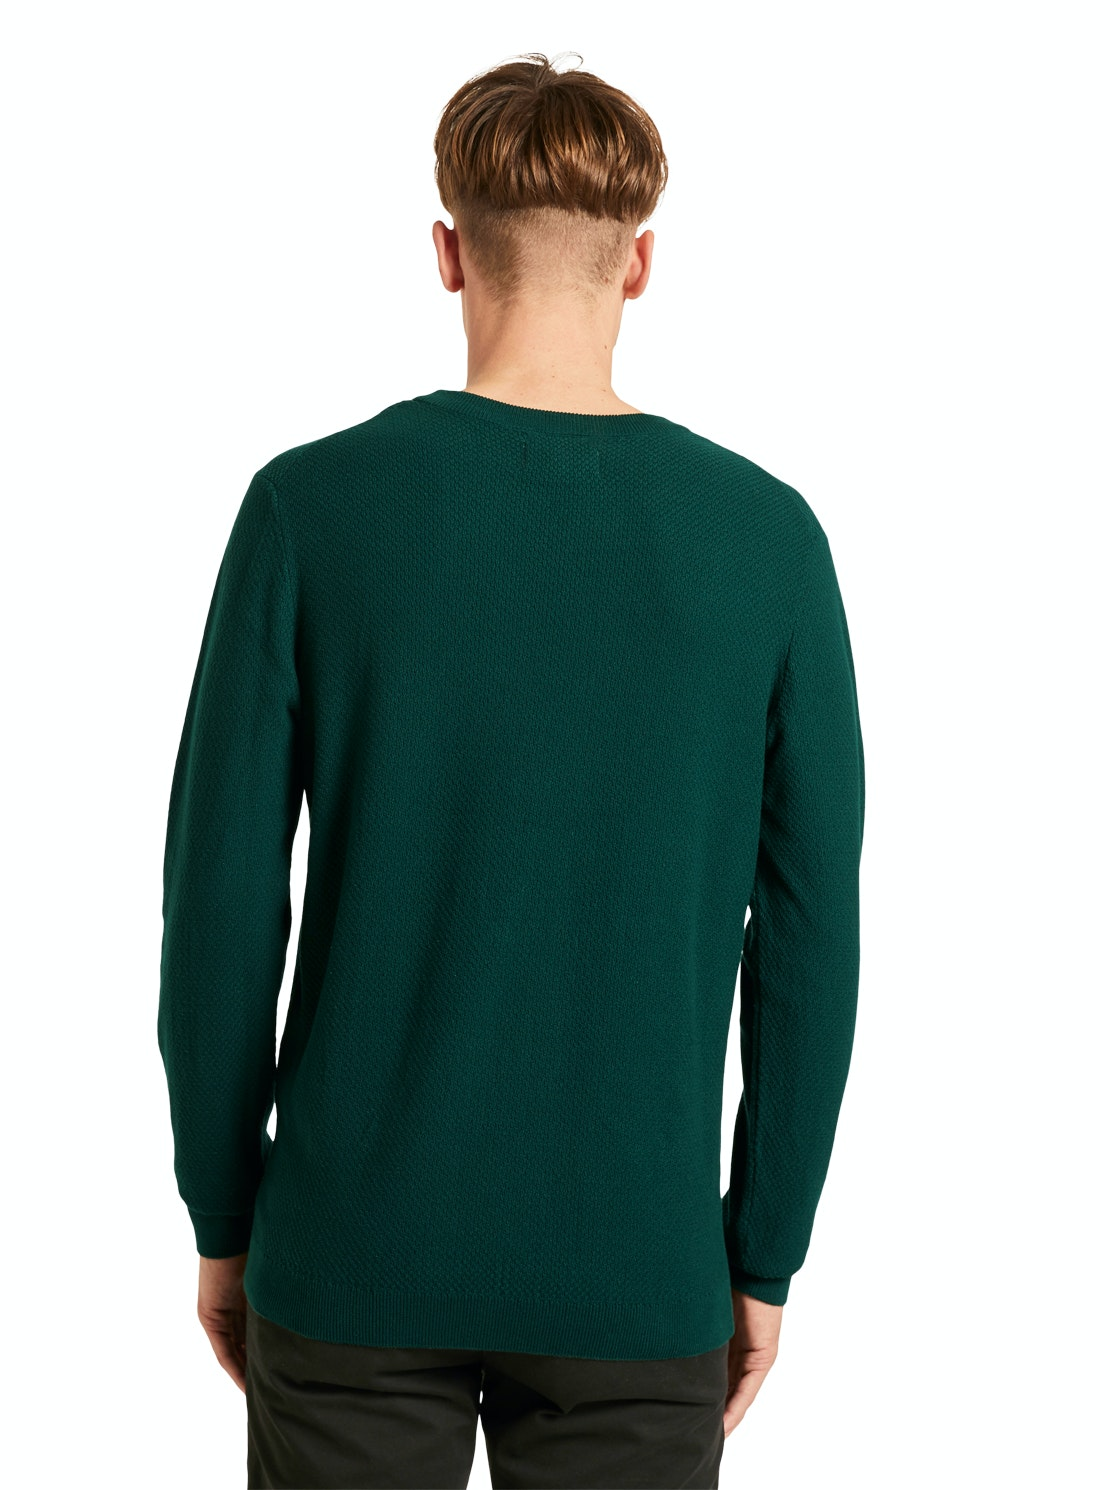 Tom Tailor Pullover Brick Wall